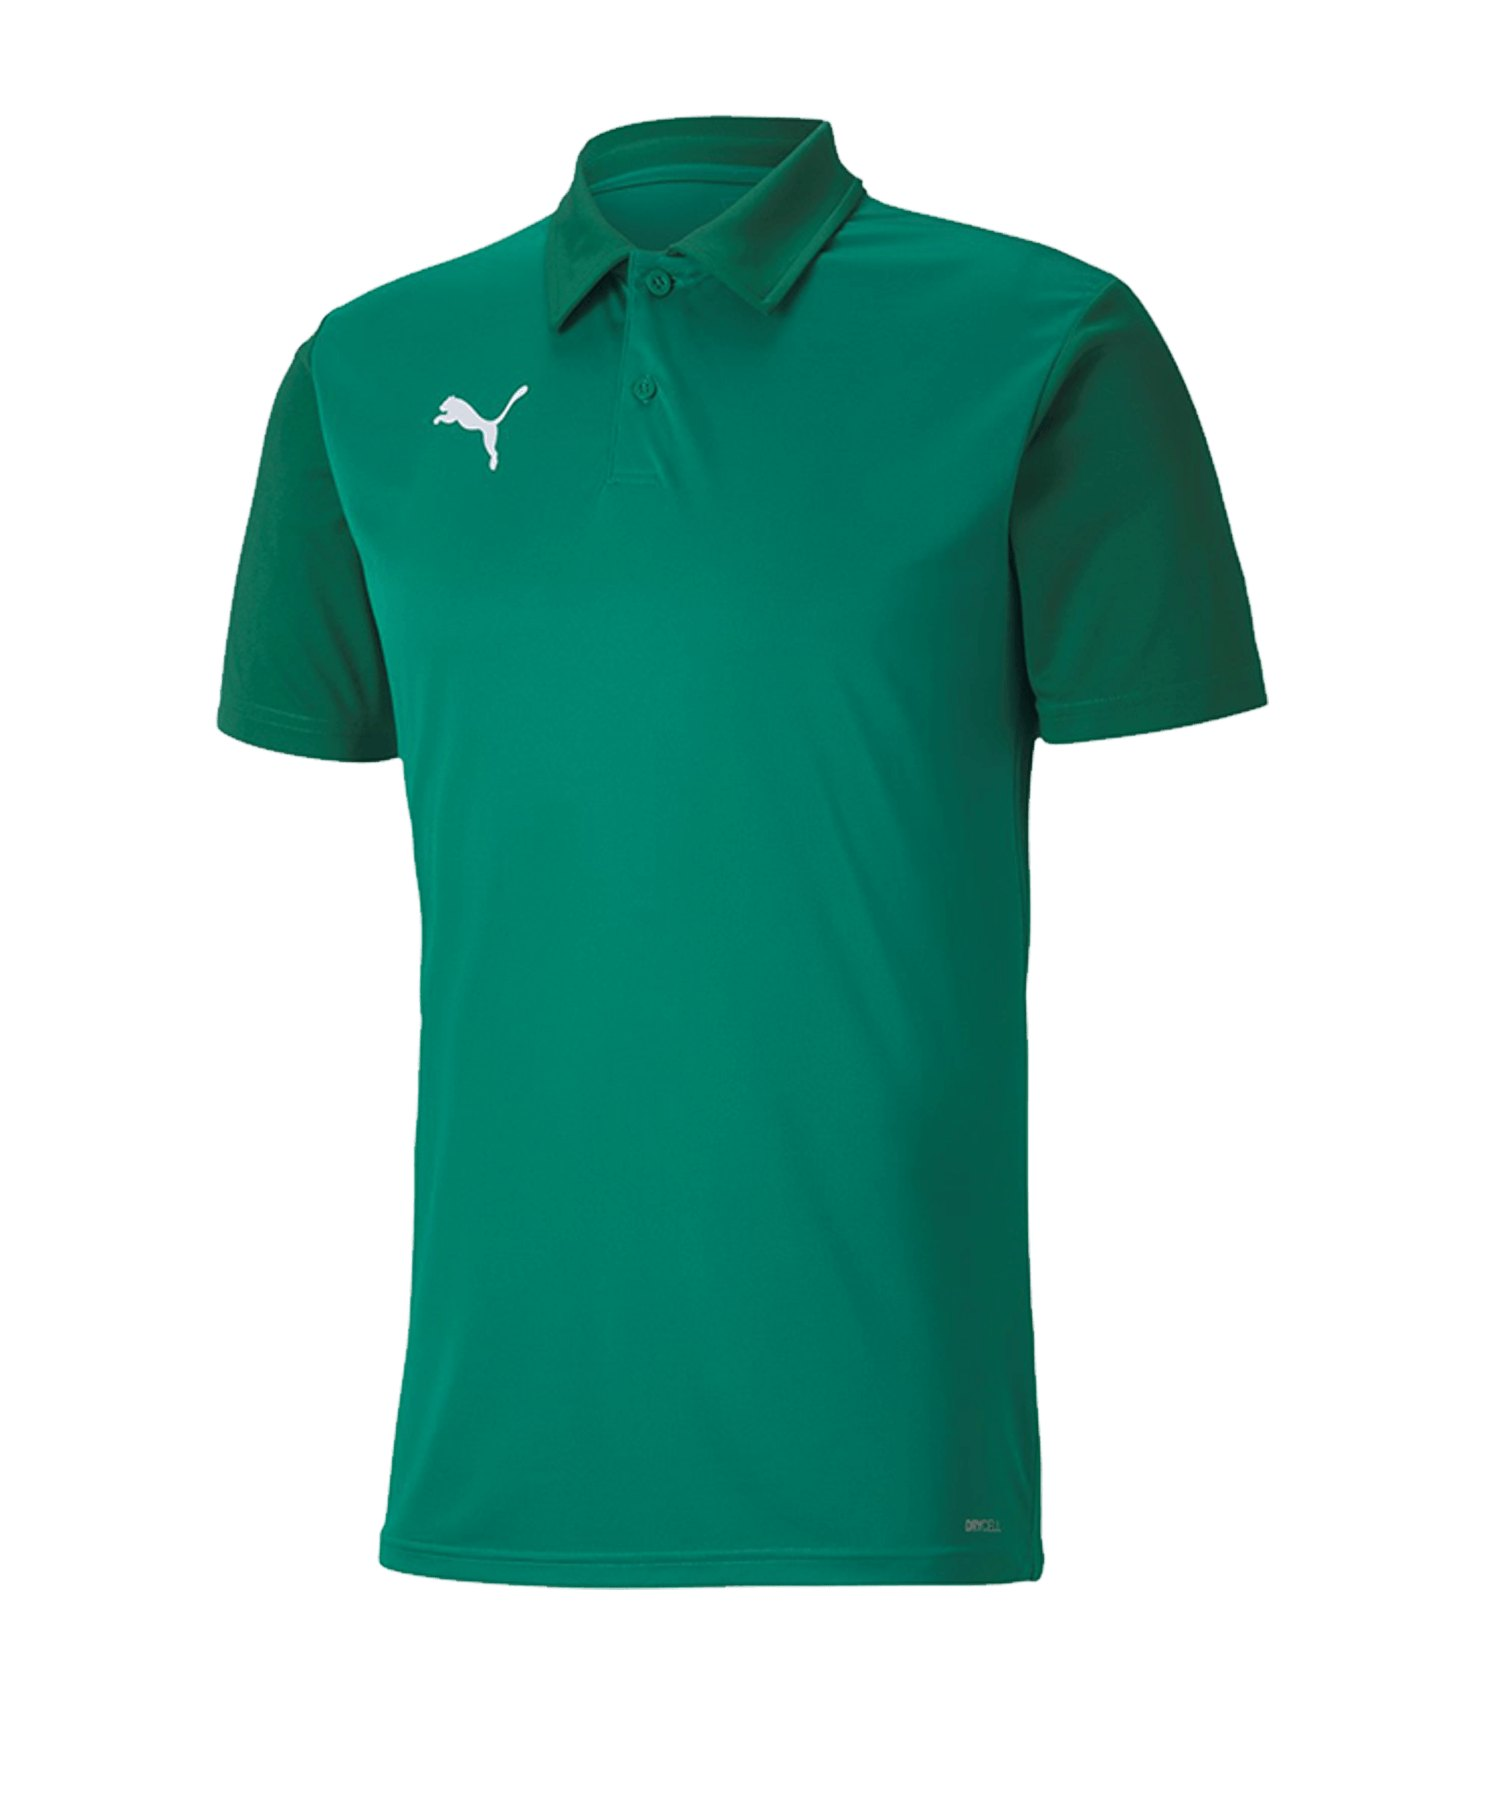 PUMA teamGOAL 23 Sideline Poloshirt Grün F05 - Gruen